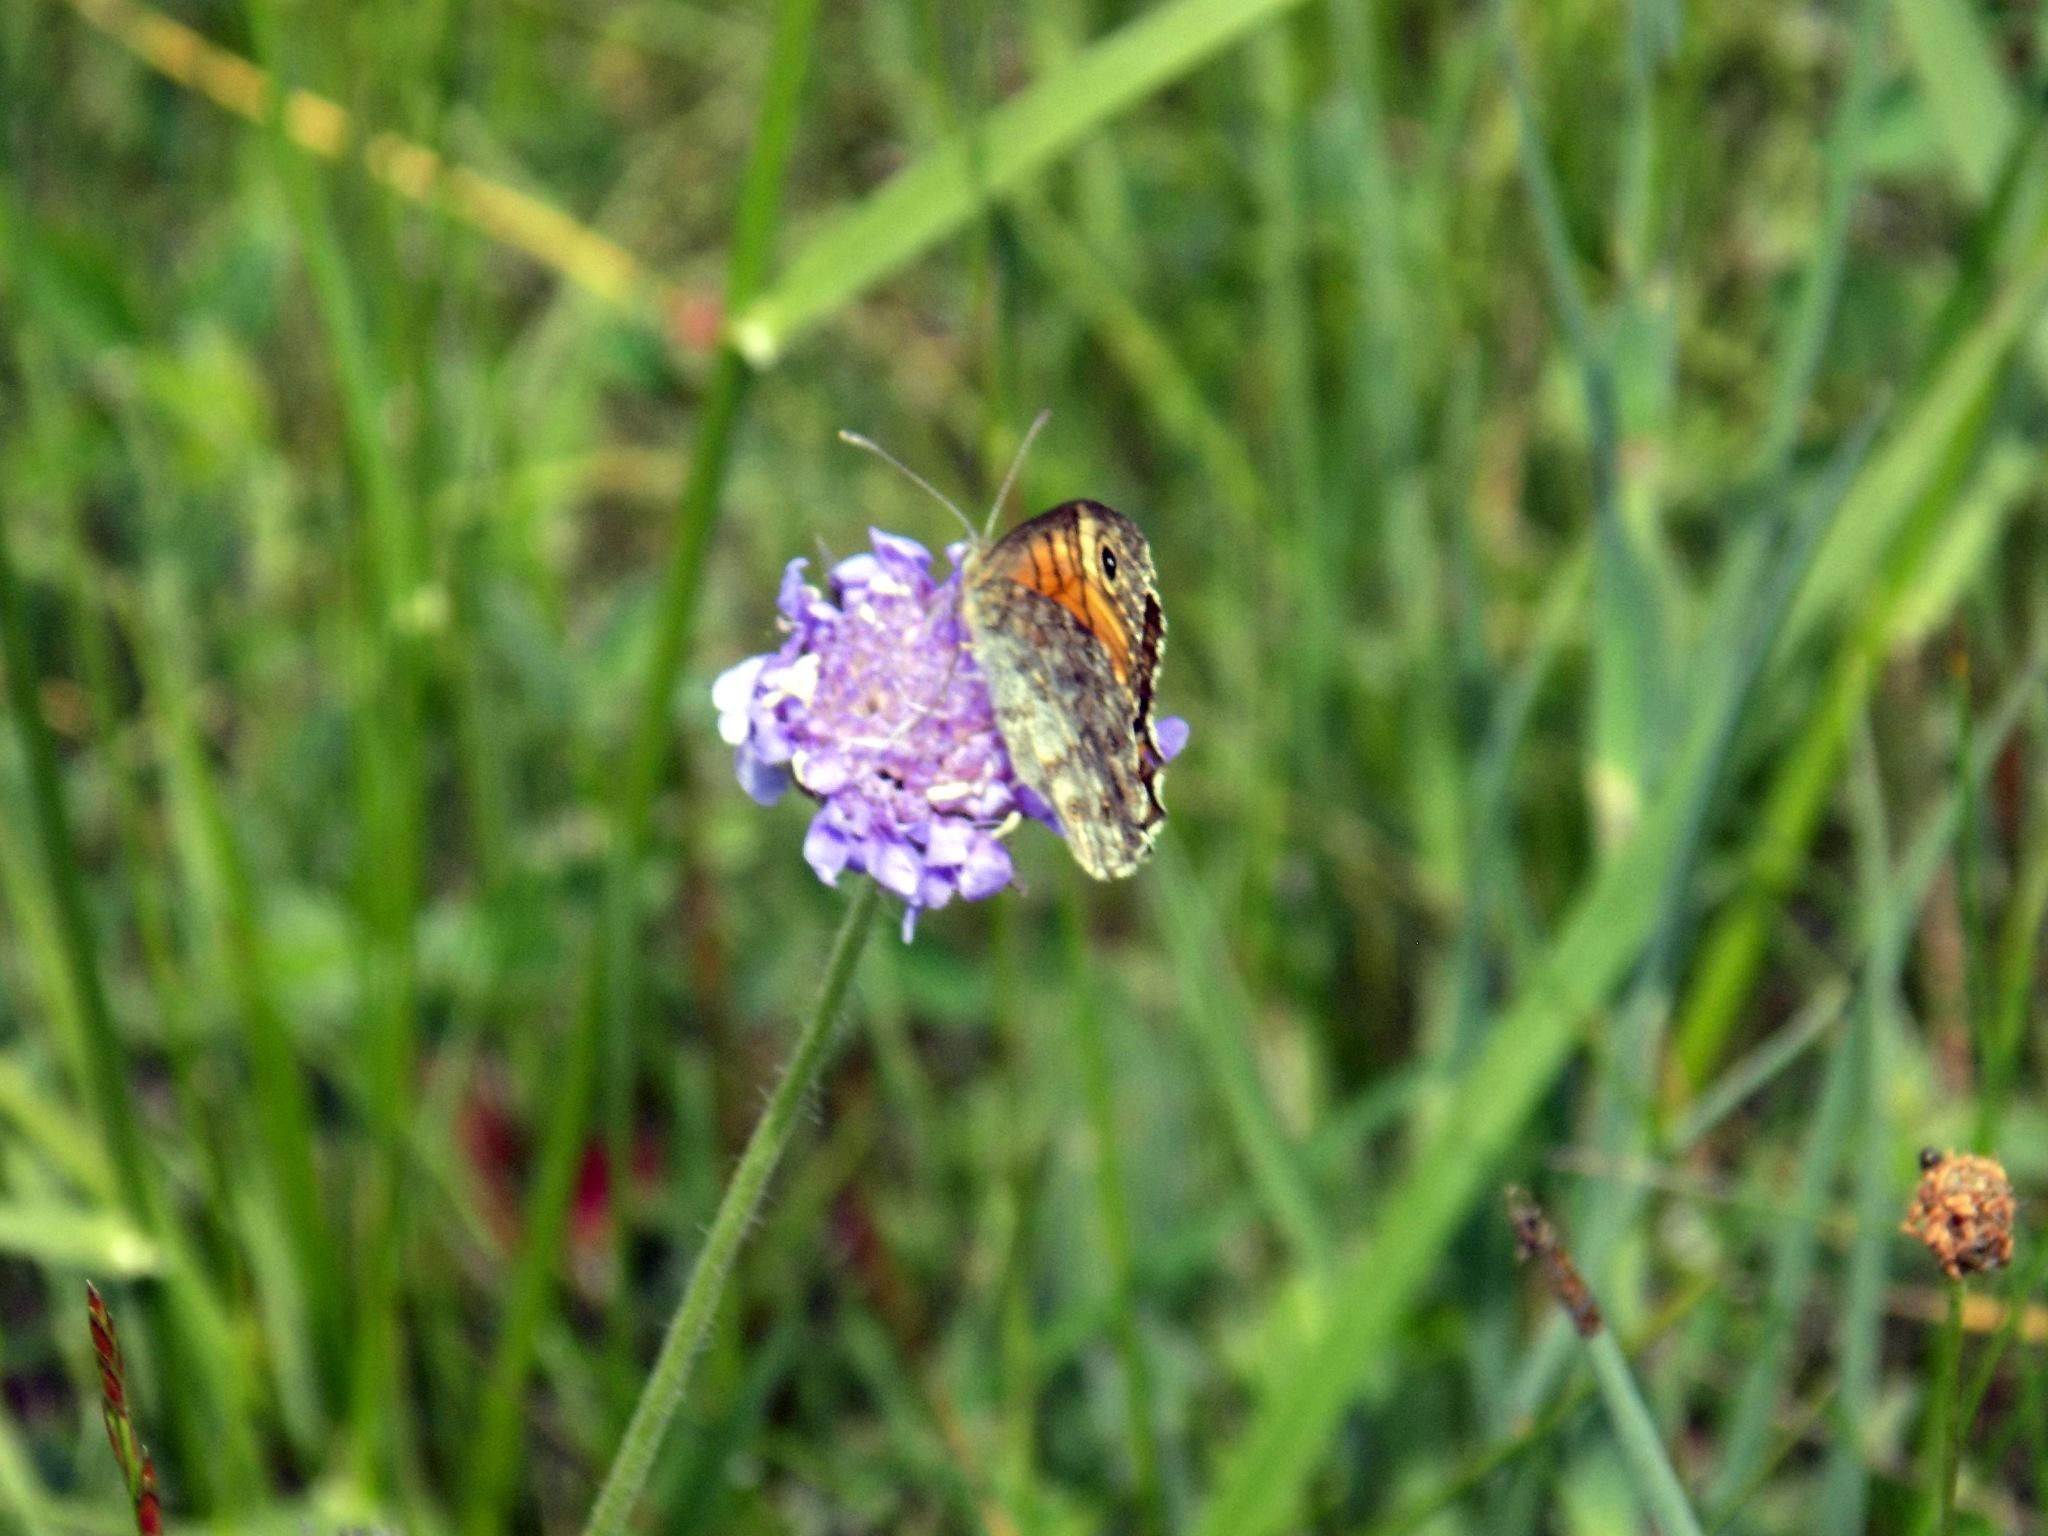 Flower with butterfly. by uzkuraitiene62